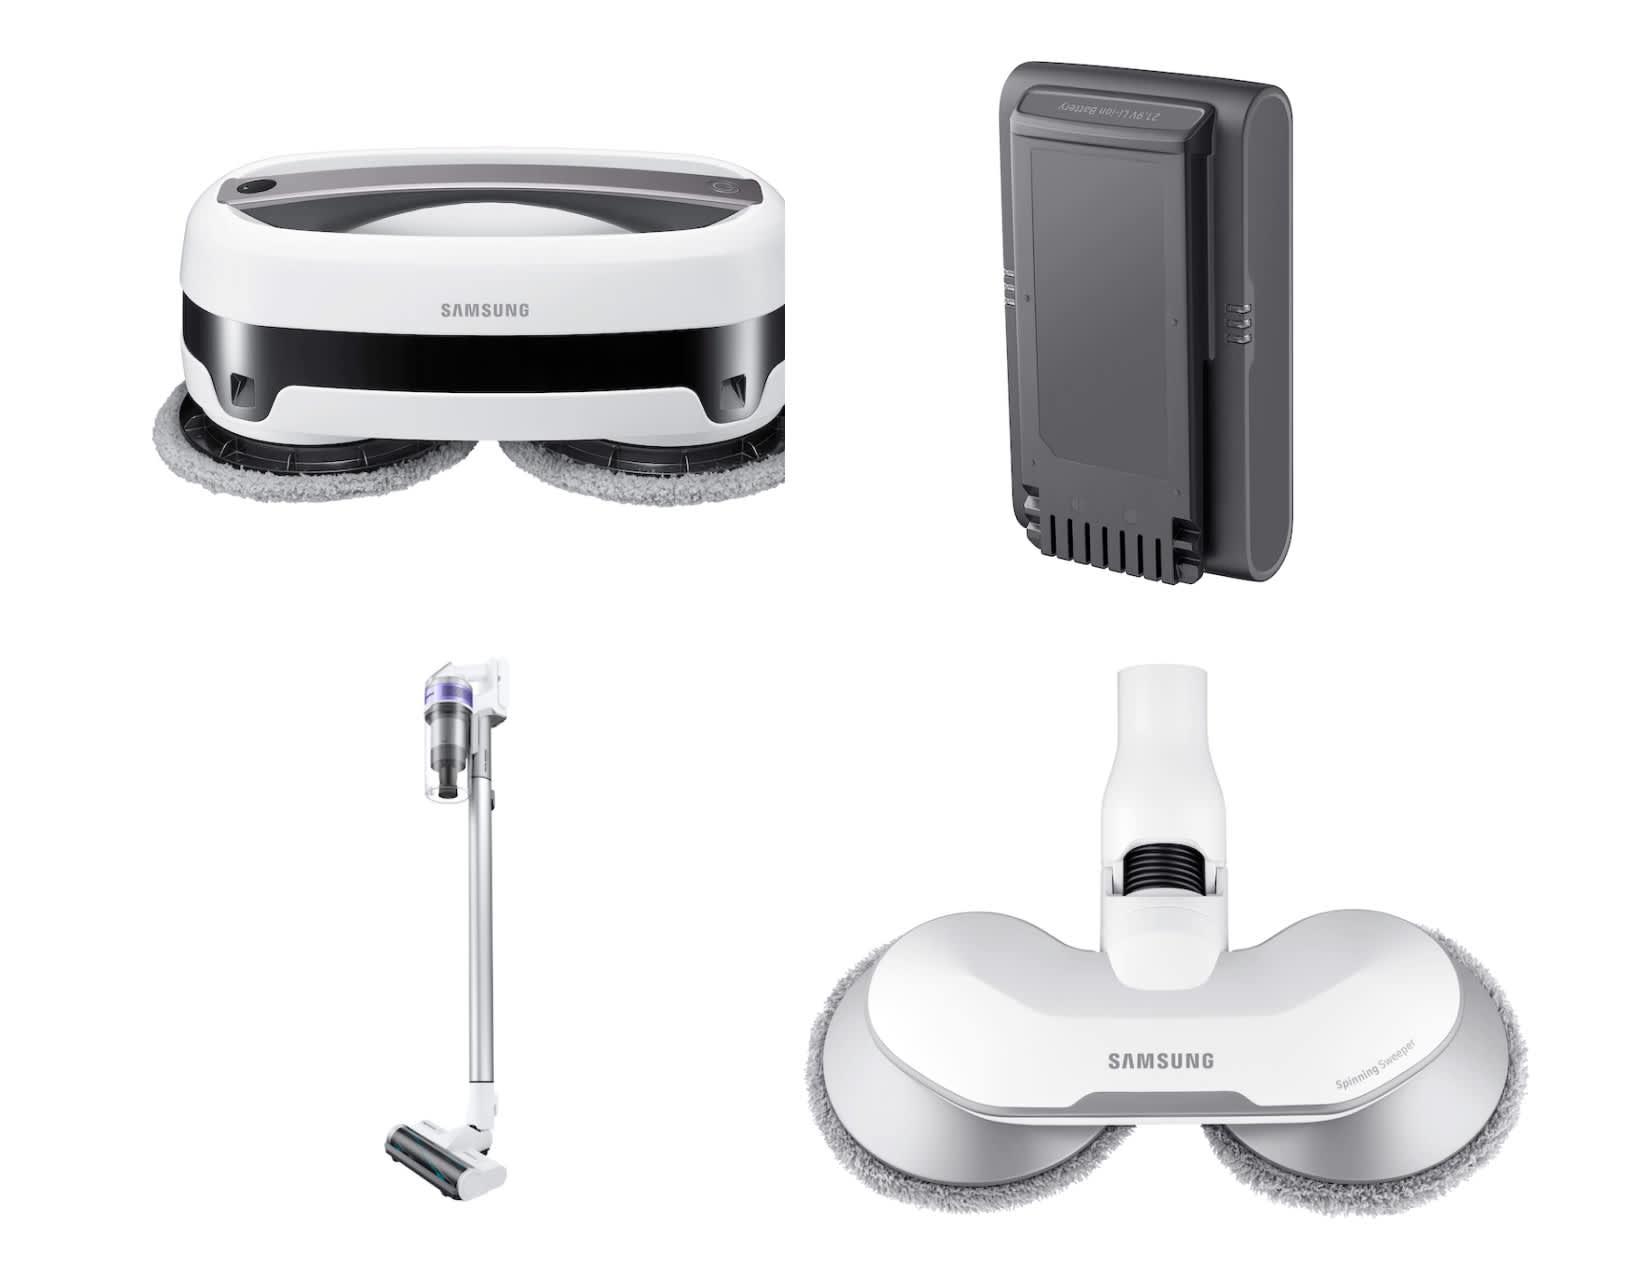 Samsung Jet Stick Vacuums, Jetbot Mops, & Accessories